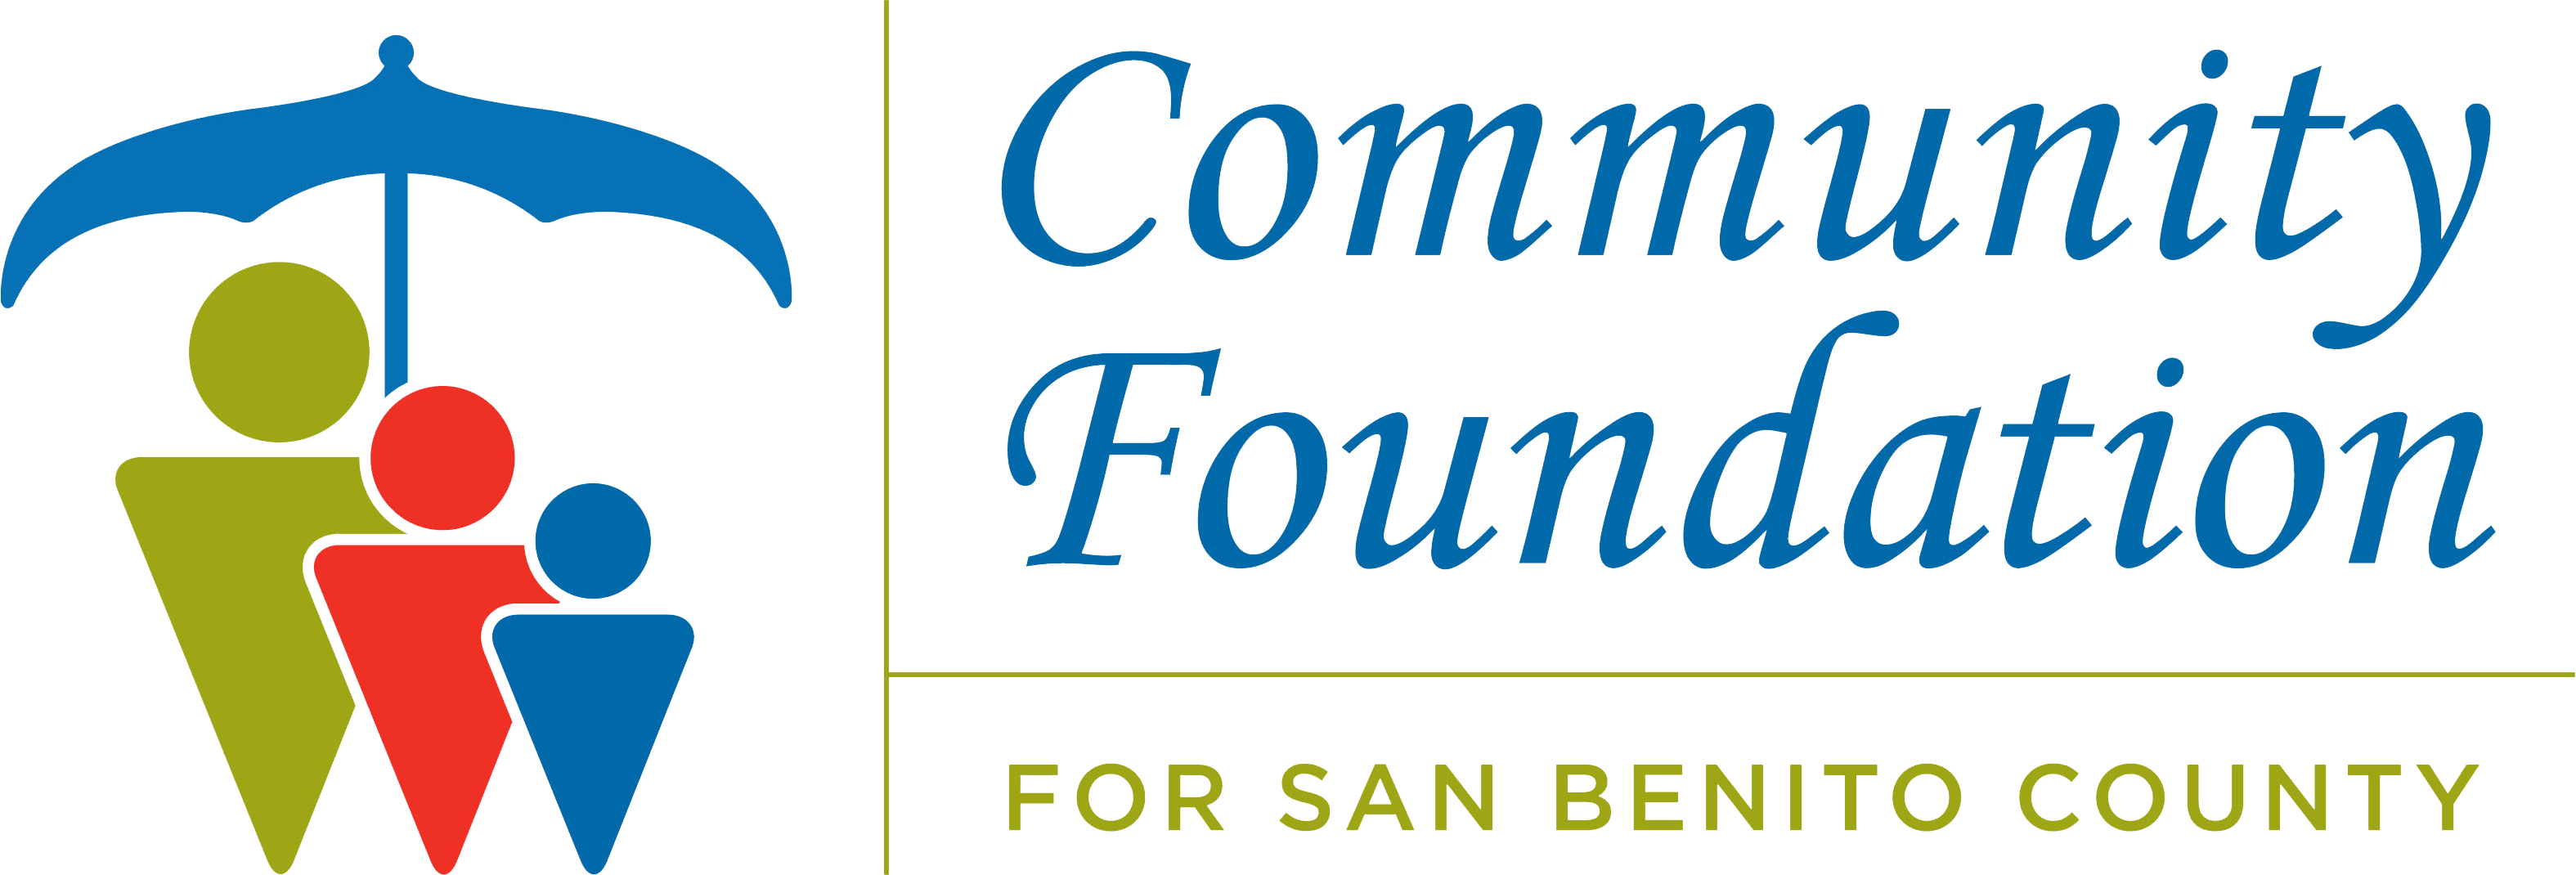 Community Foundation of San Benito County